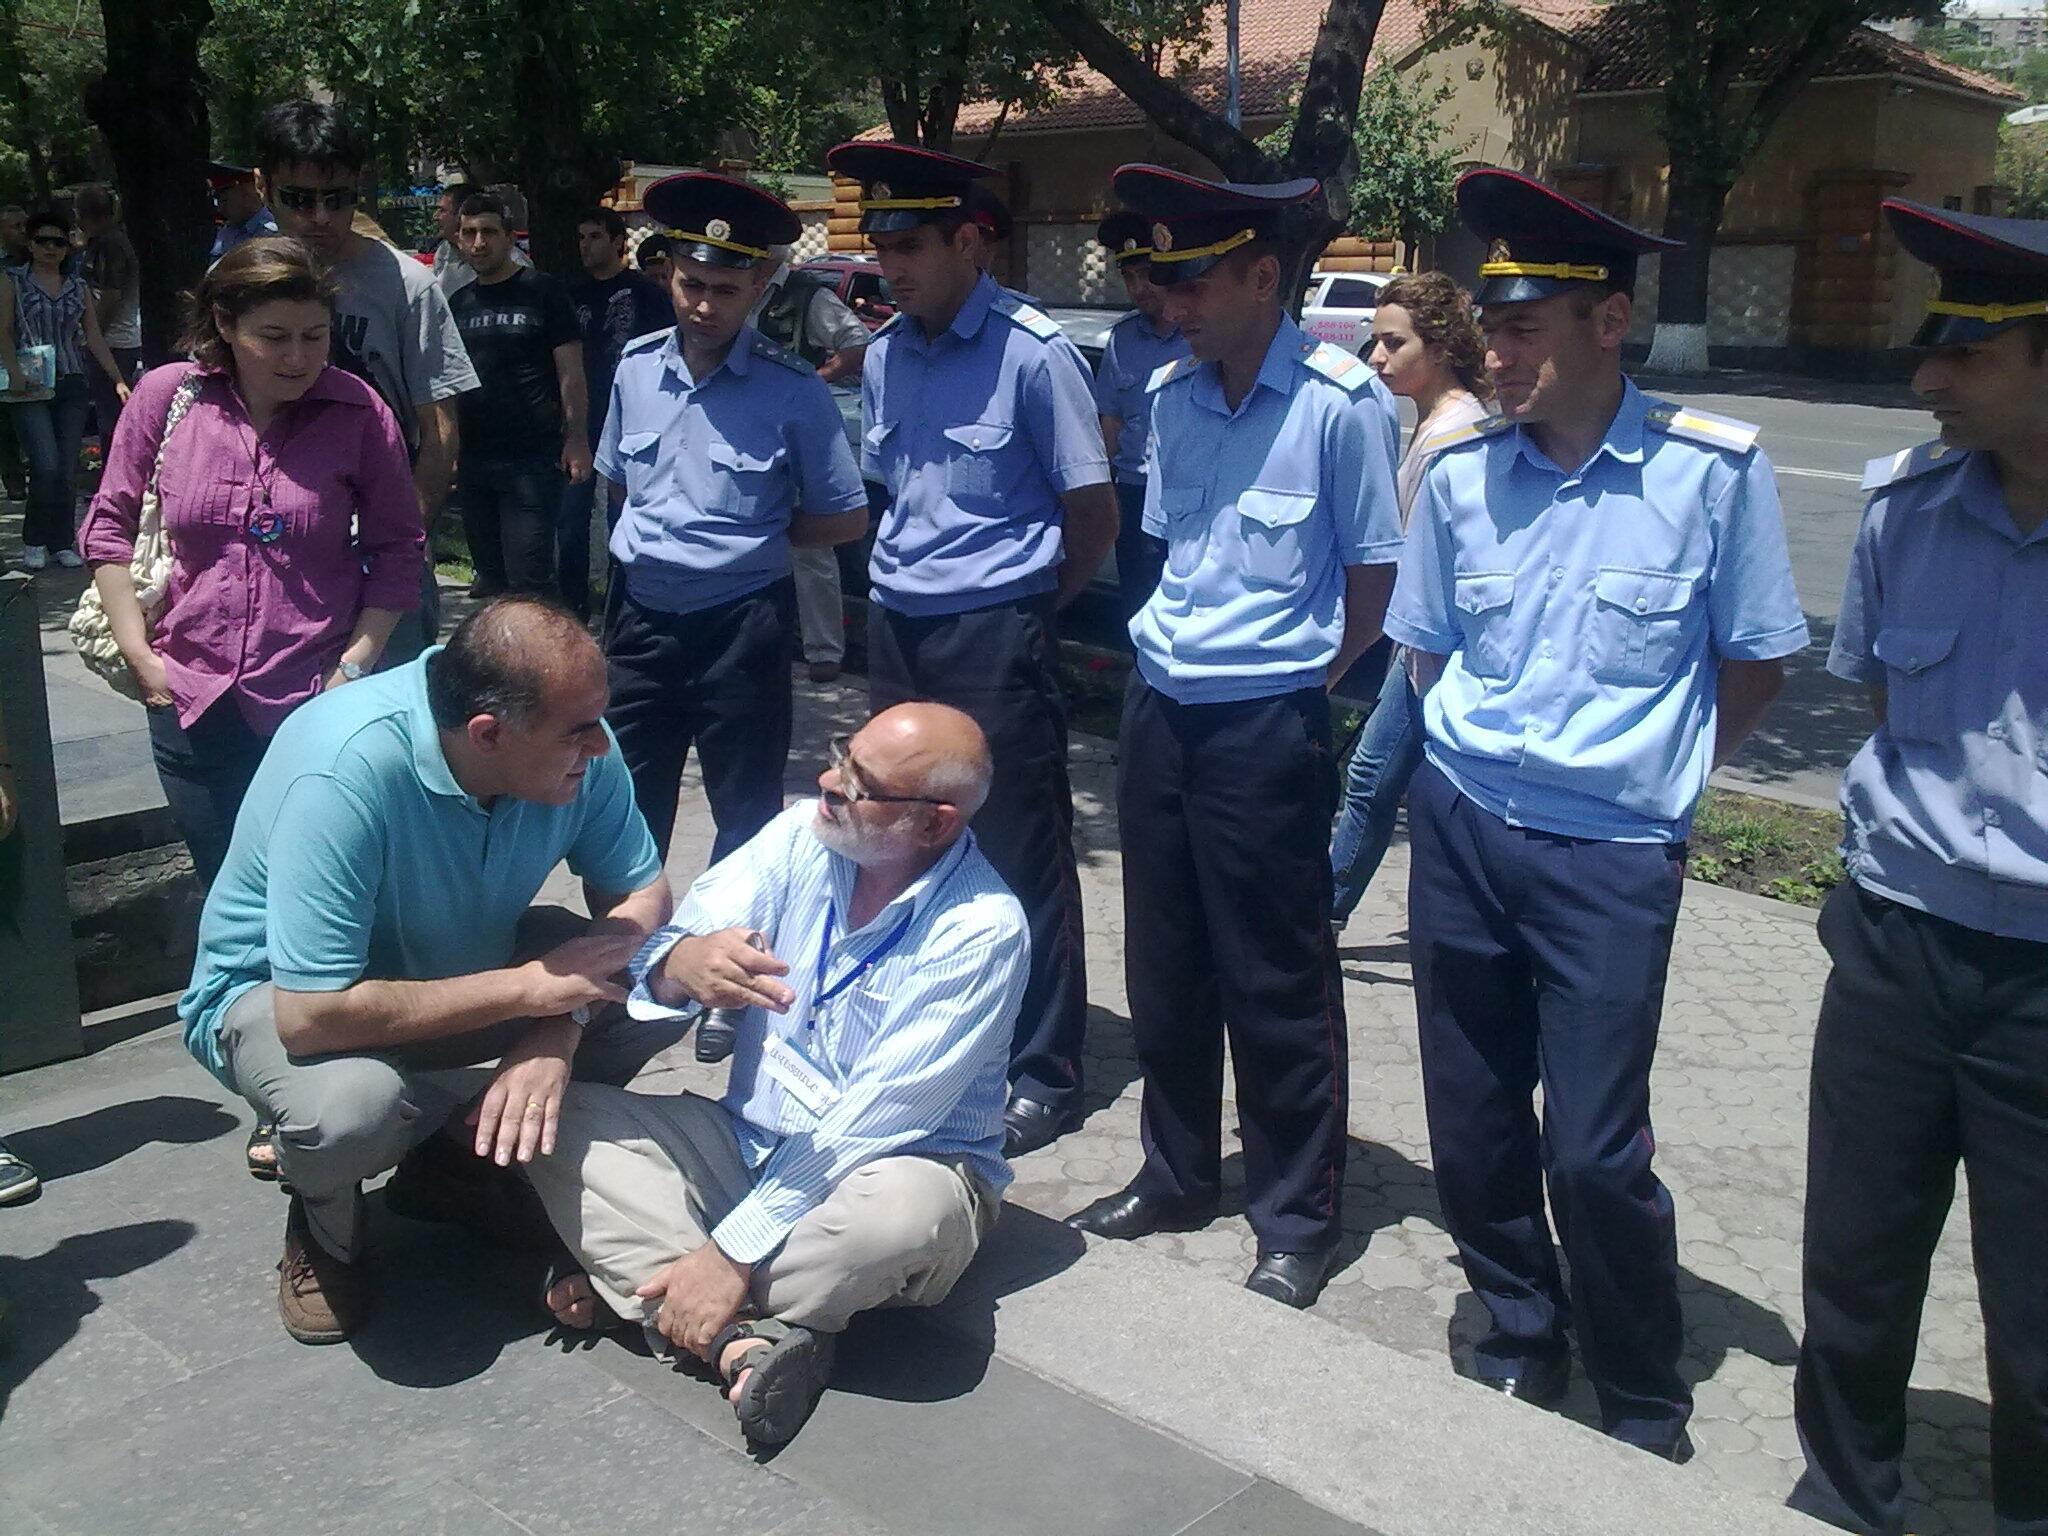 Акция протеста в Ереване, 1 июля 2012